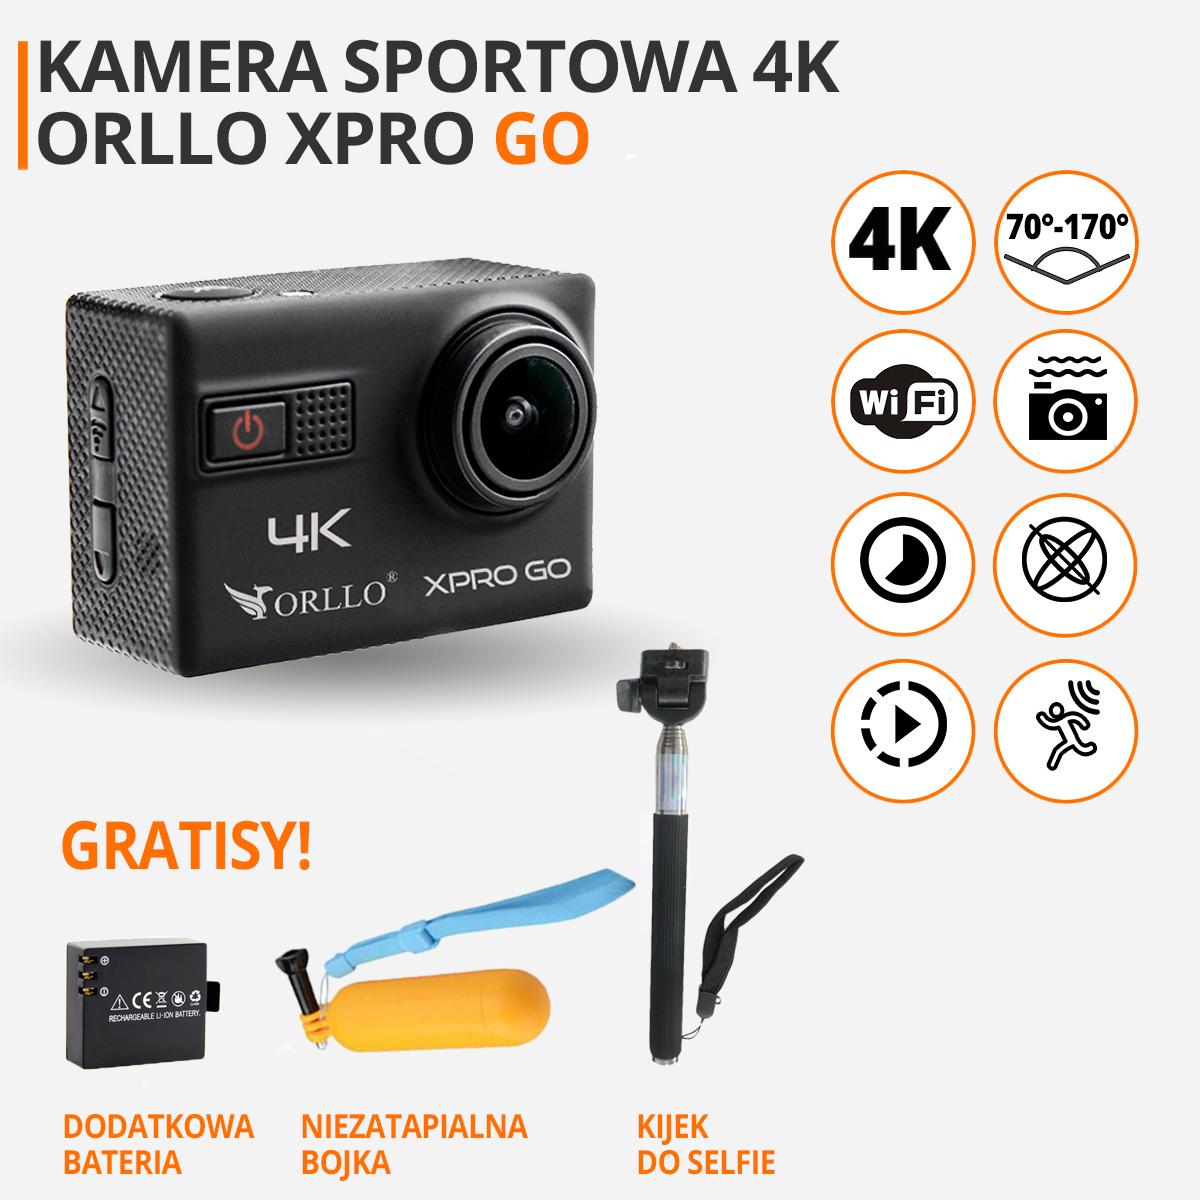 kamerka-sportowa-XPRO-GO-orllo-pl